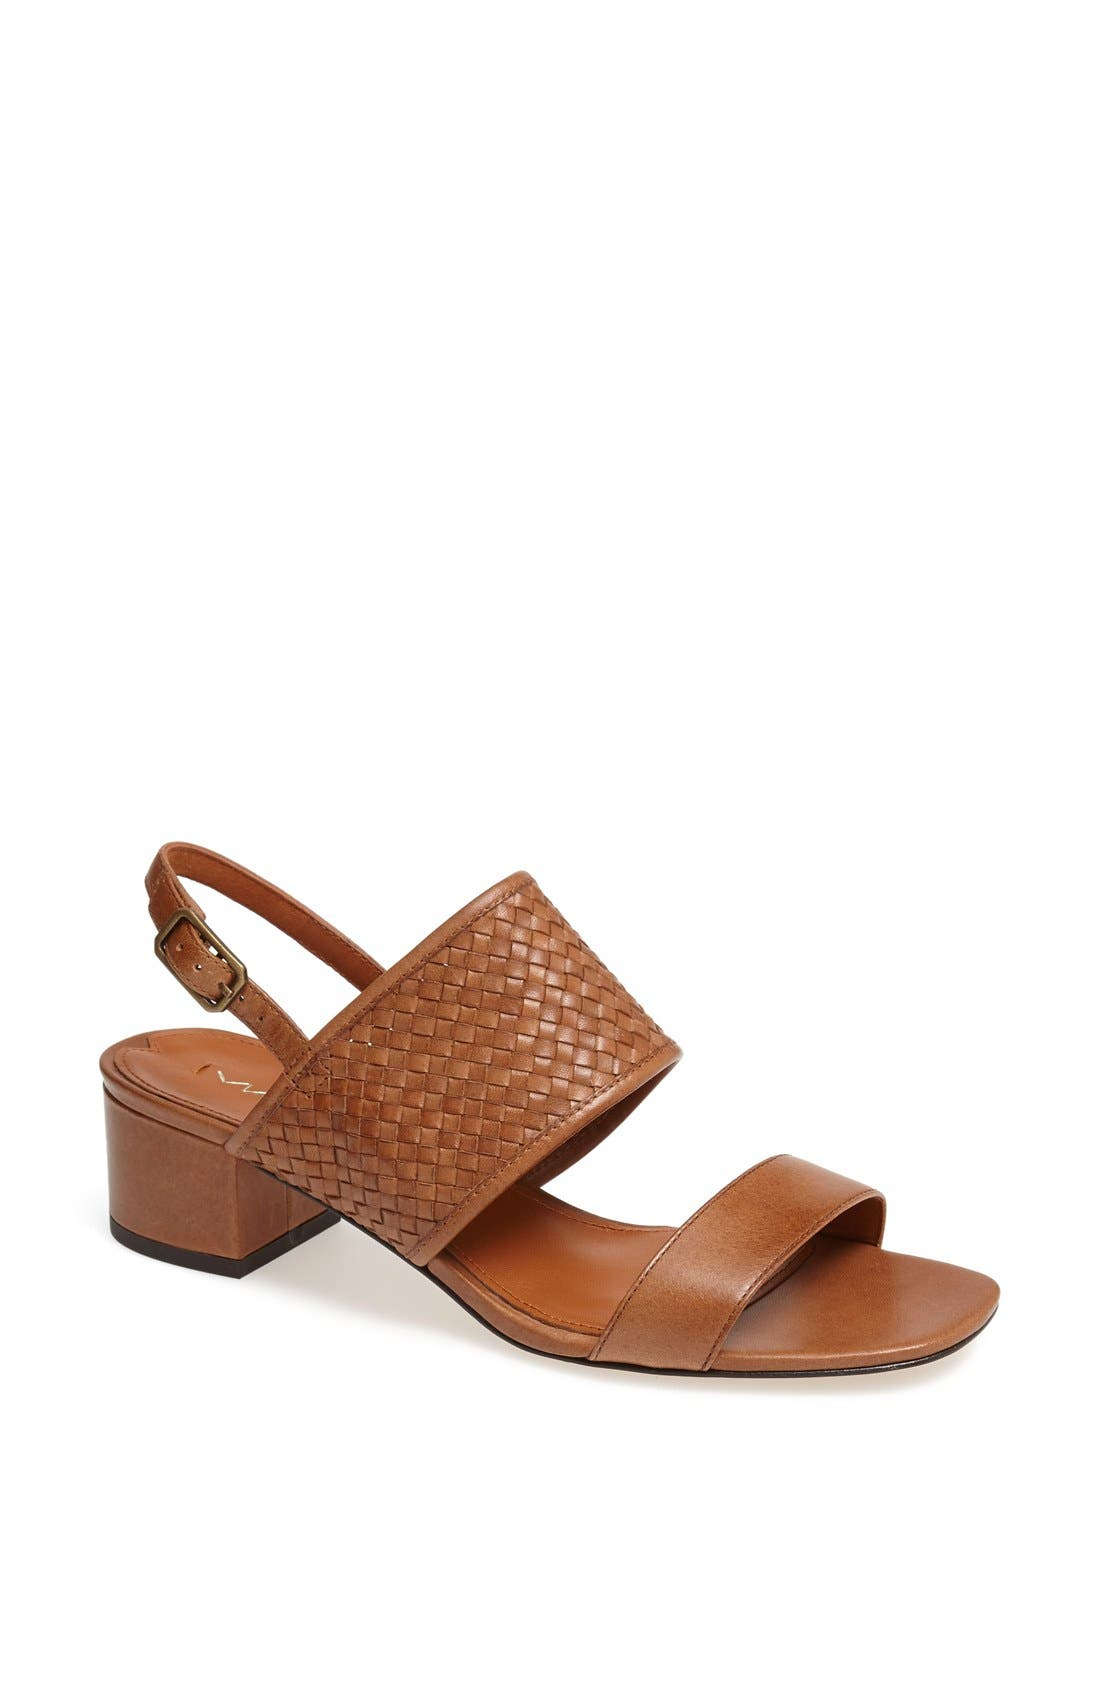 Main Image - Via Spiga 'Cairo2' Leather Sandal